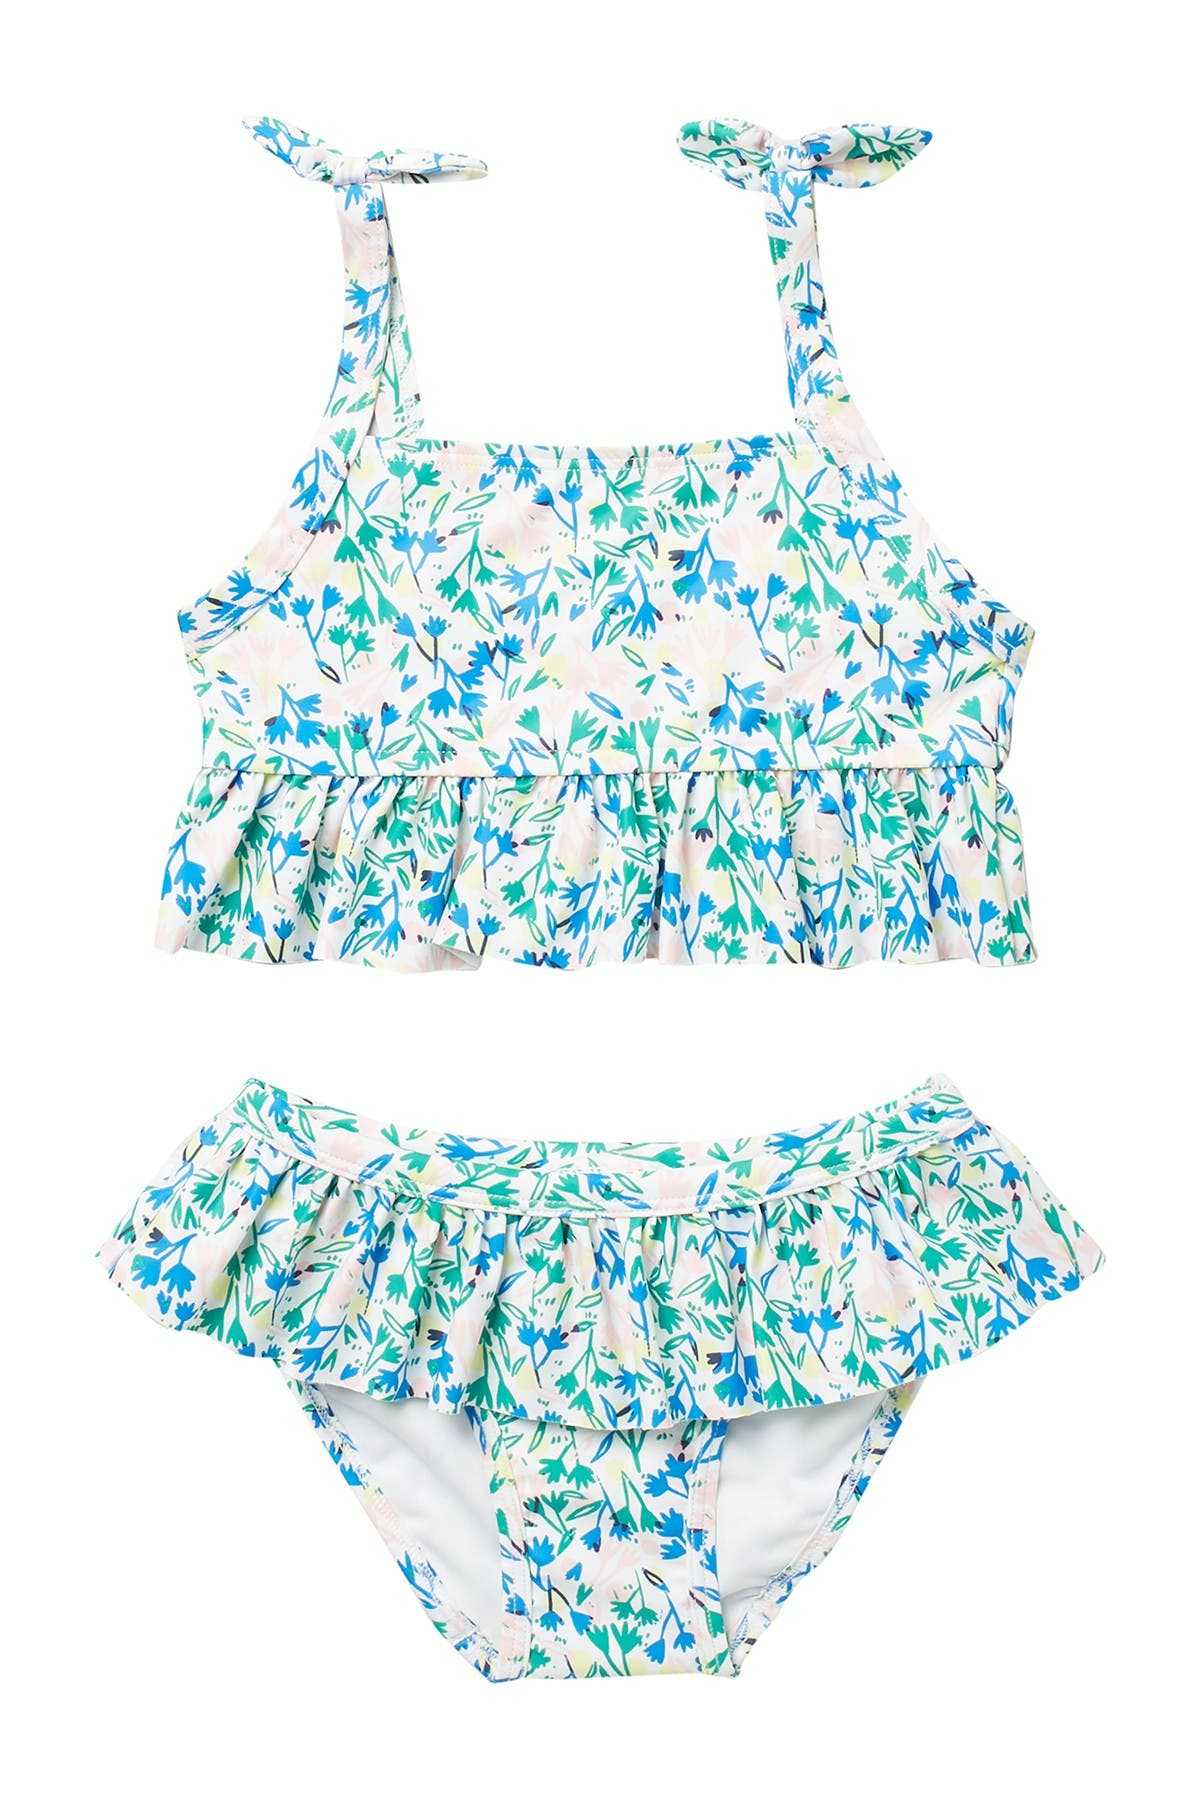 Image of Harper Canyon Ruffle Trim Tankini Swimsuit